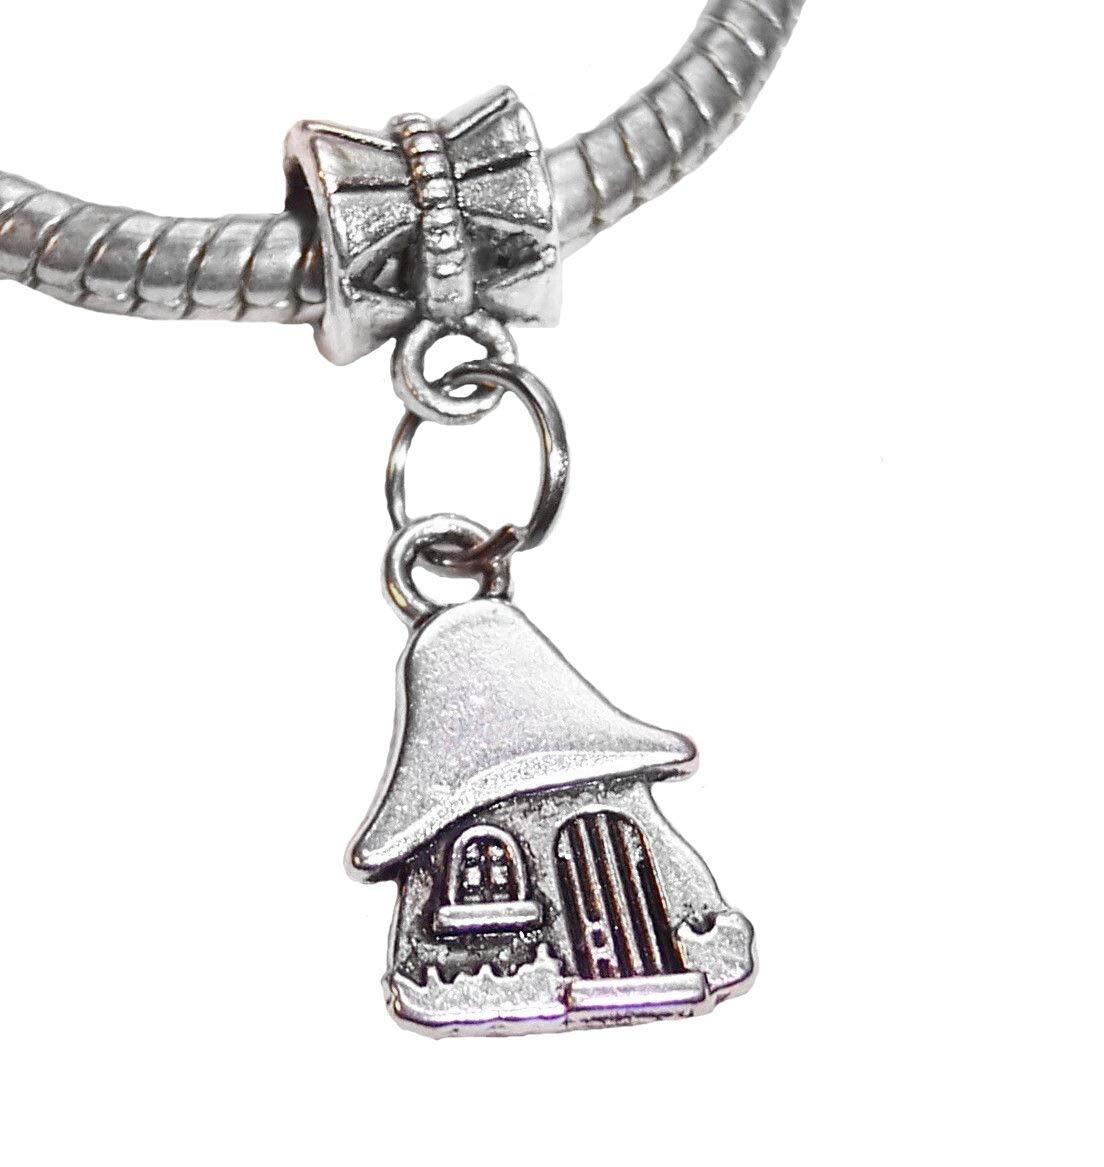 Mushroom House Fairytale Woods Dangle Charm for European Bead Slide Bracelets id-2611